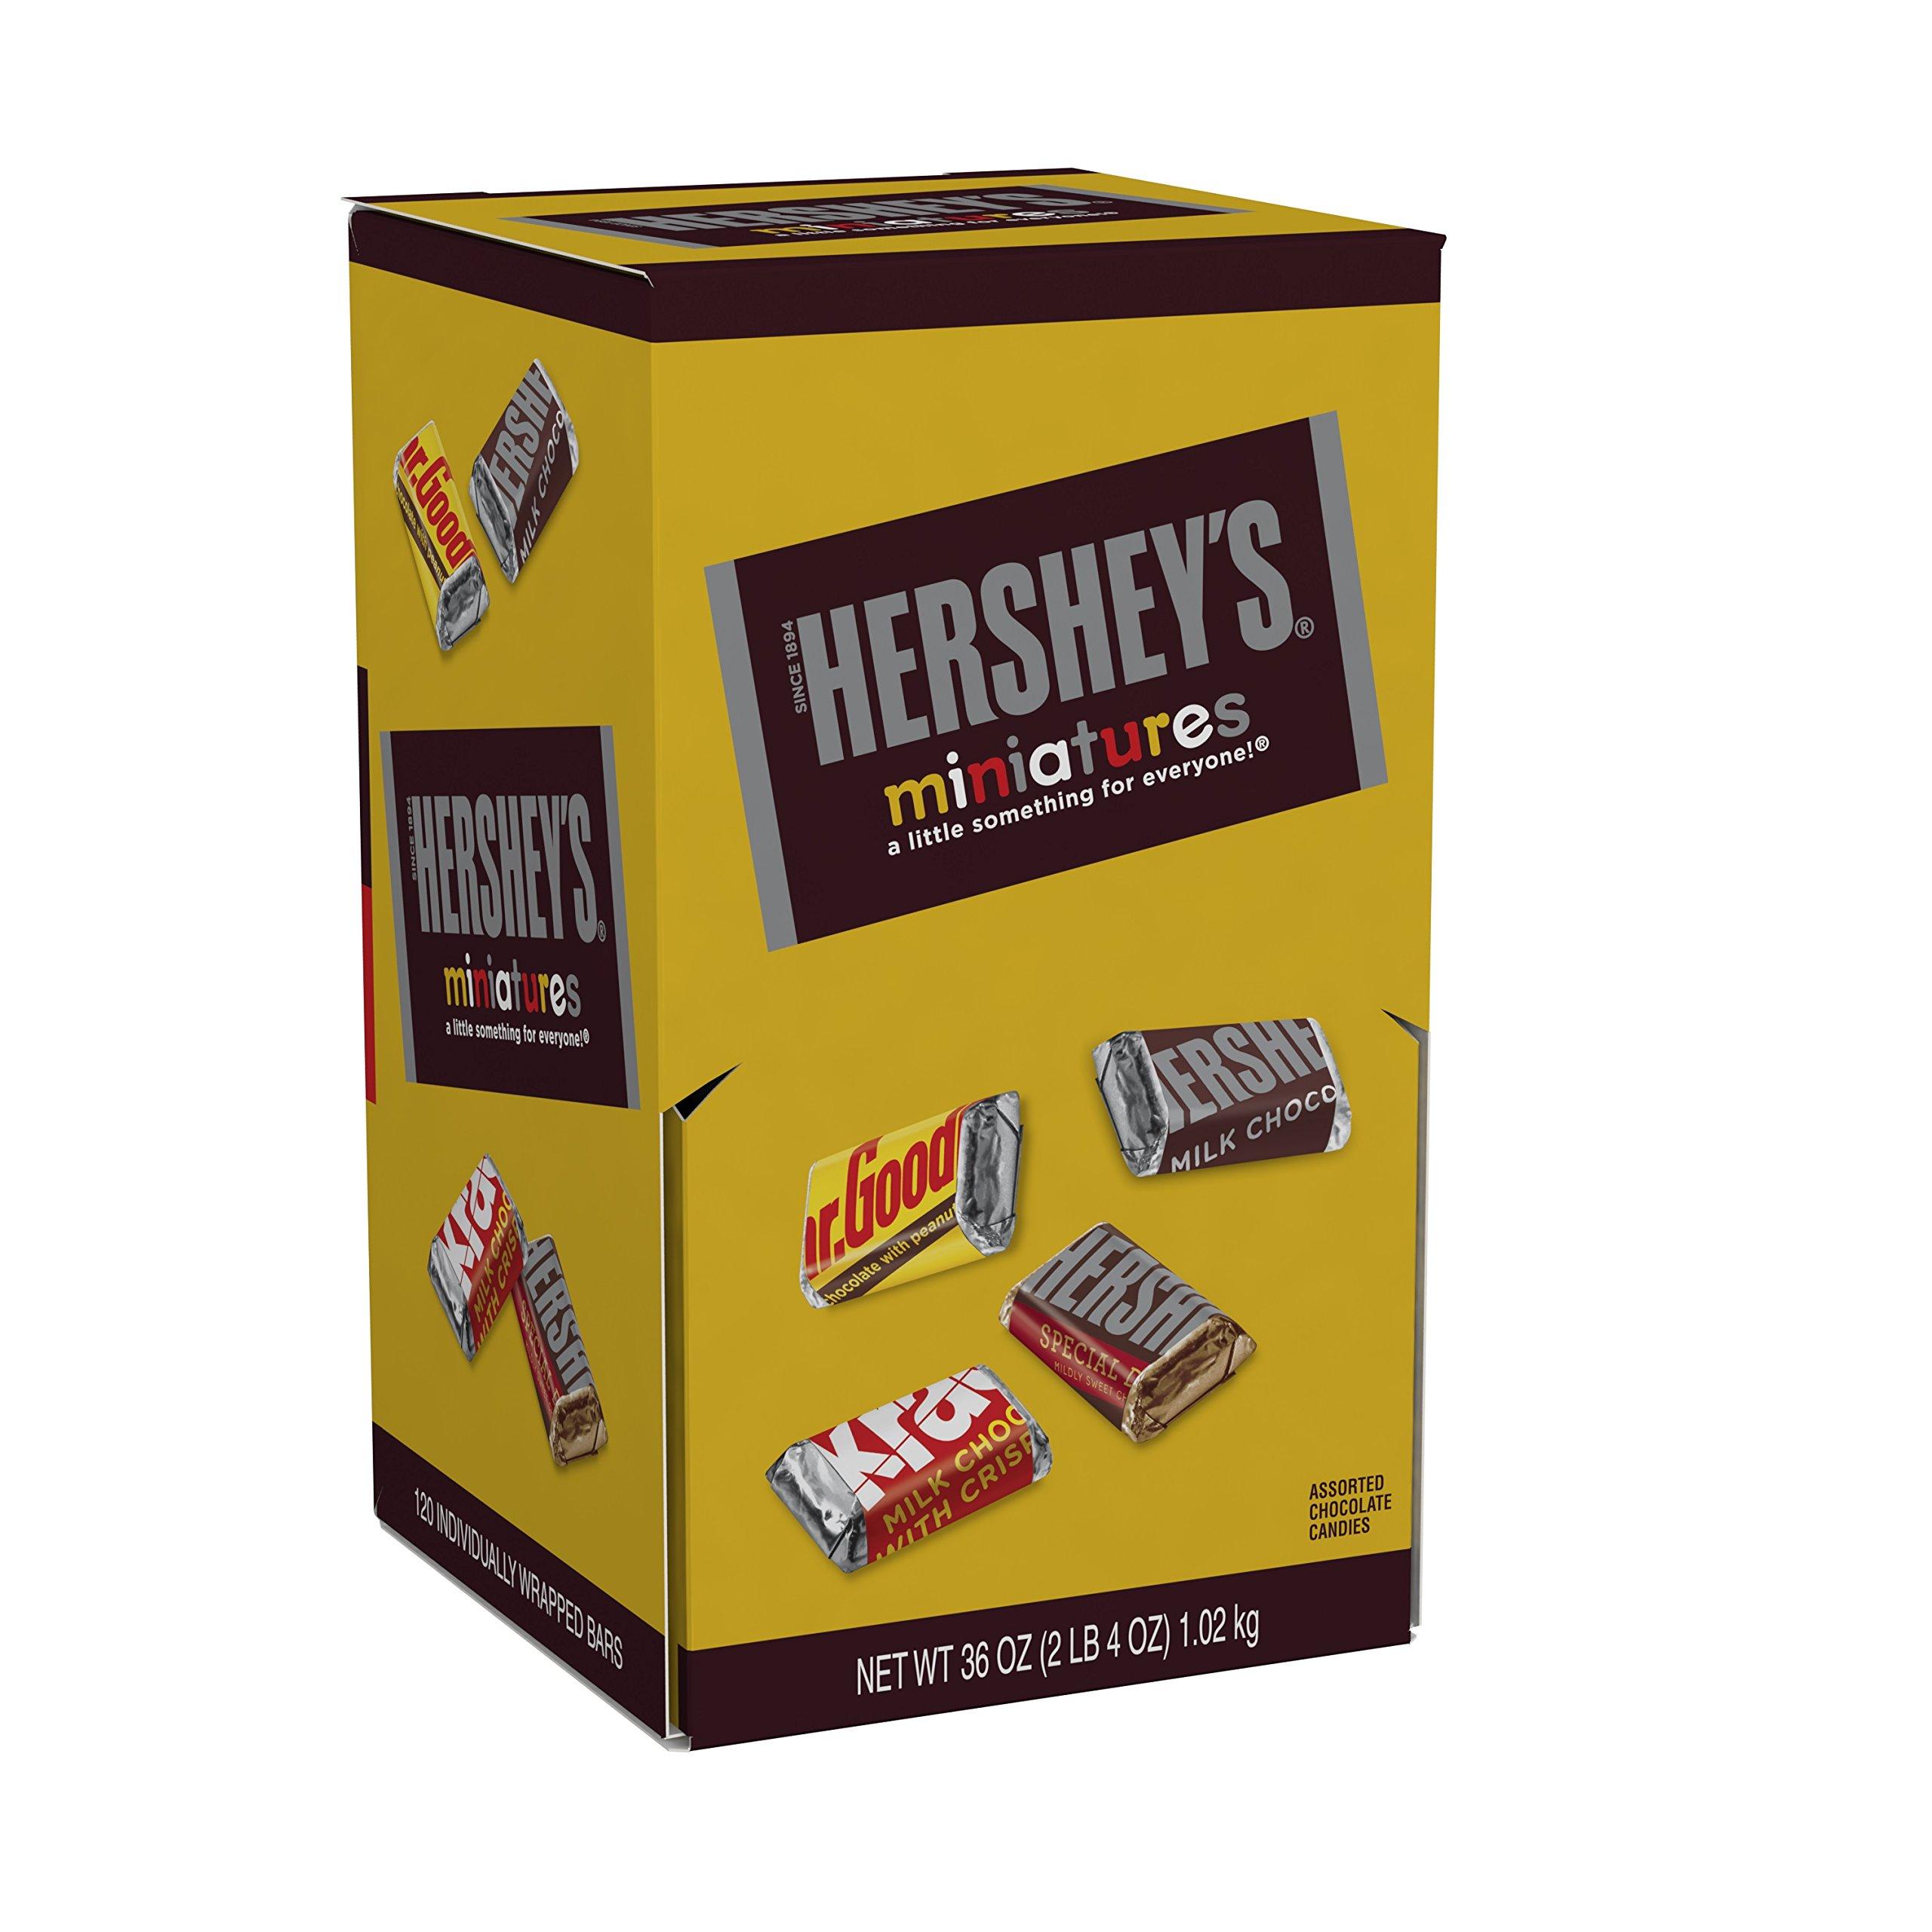 HERSHEY'S Chocolate Candy Bar Assortment, Miniatures (Hershey's, Krackel, Mr Goodbar, Special Dark), 36 Ounce Bulk Candy